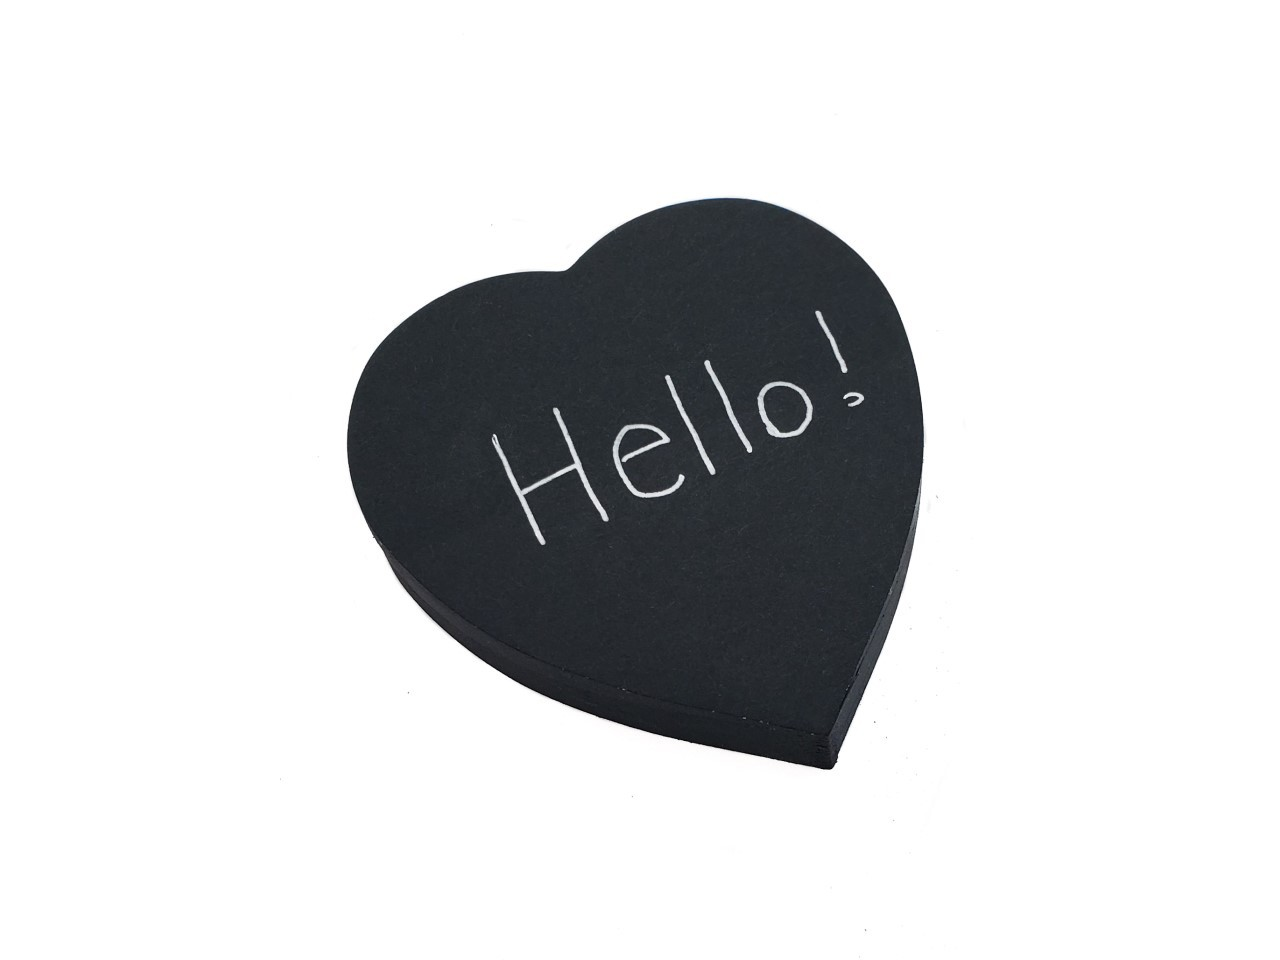 Bloco Adesivo Sticky Note Coração Preto